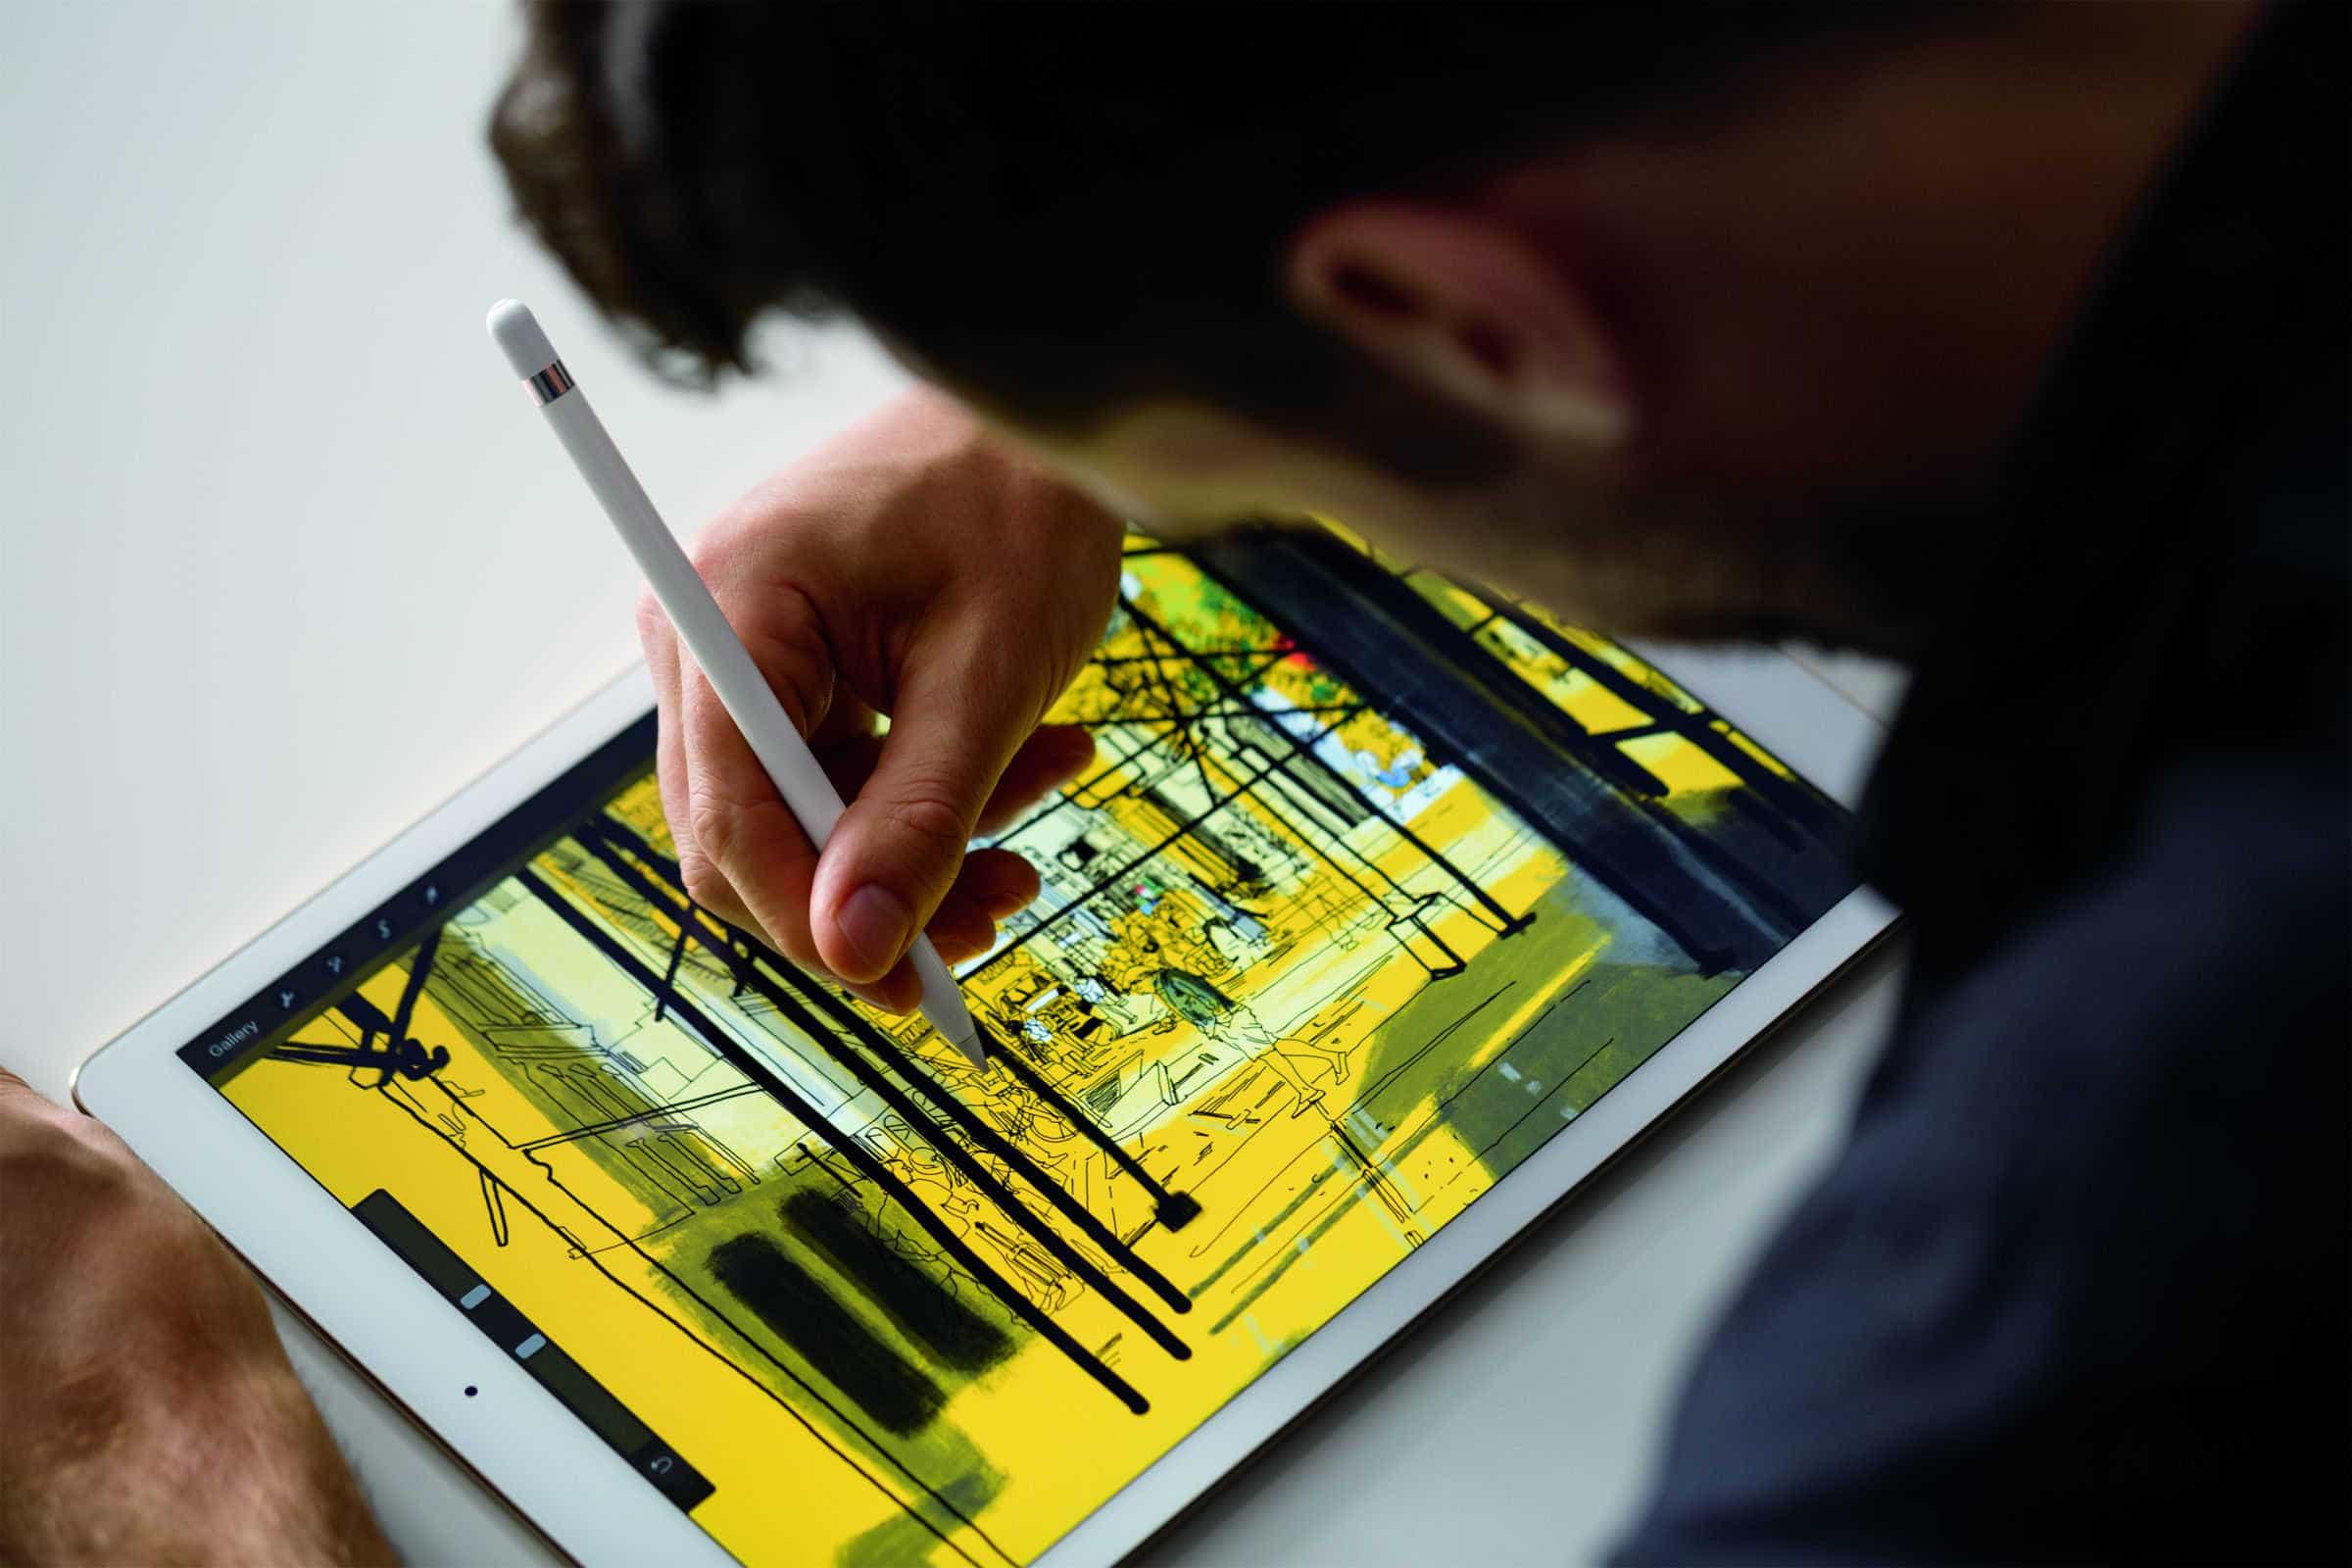 Sketching on an iPad